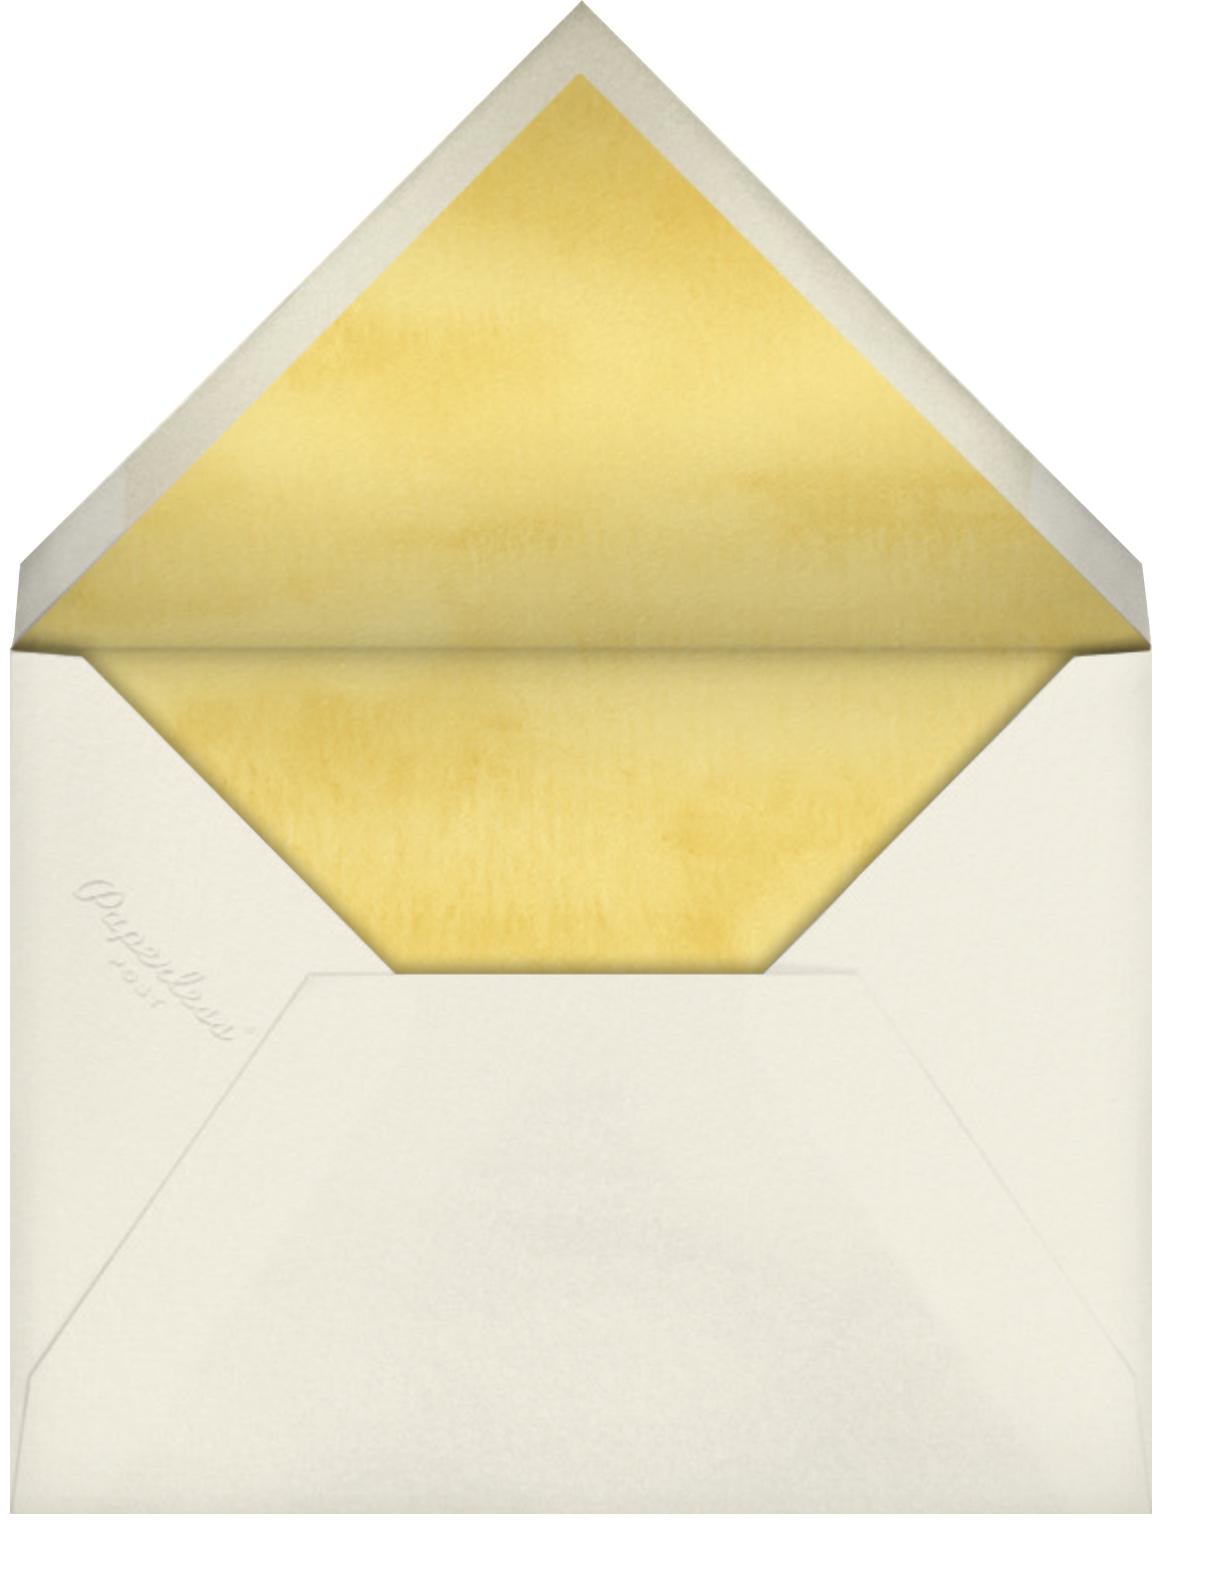 Baarat Elephant (Invitation) - Felix Doolittle - All - envelope back